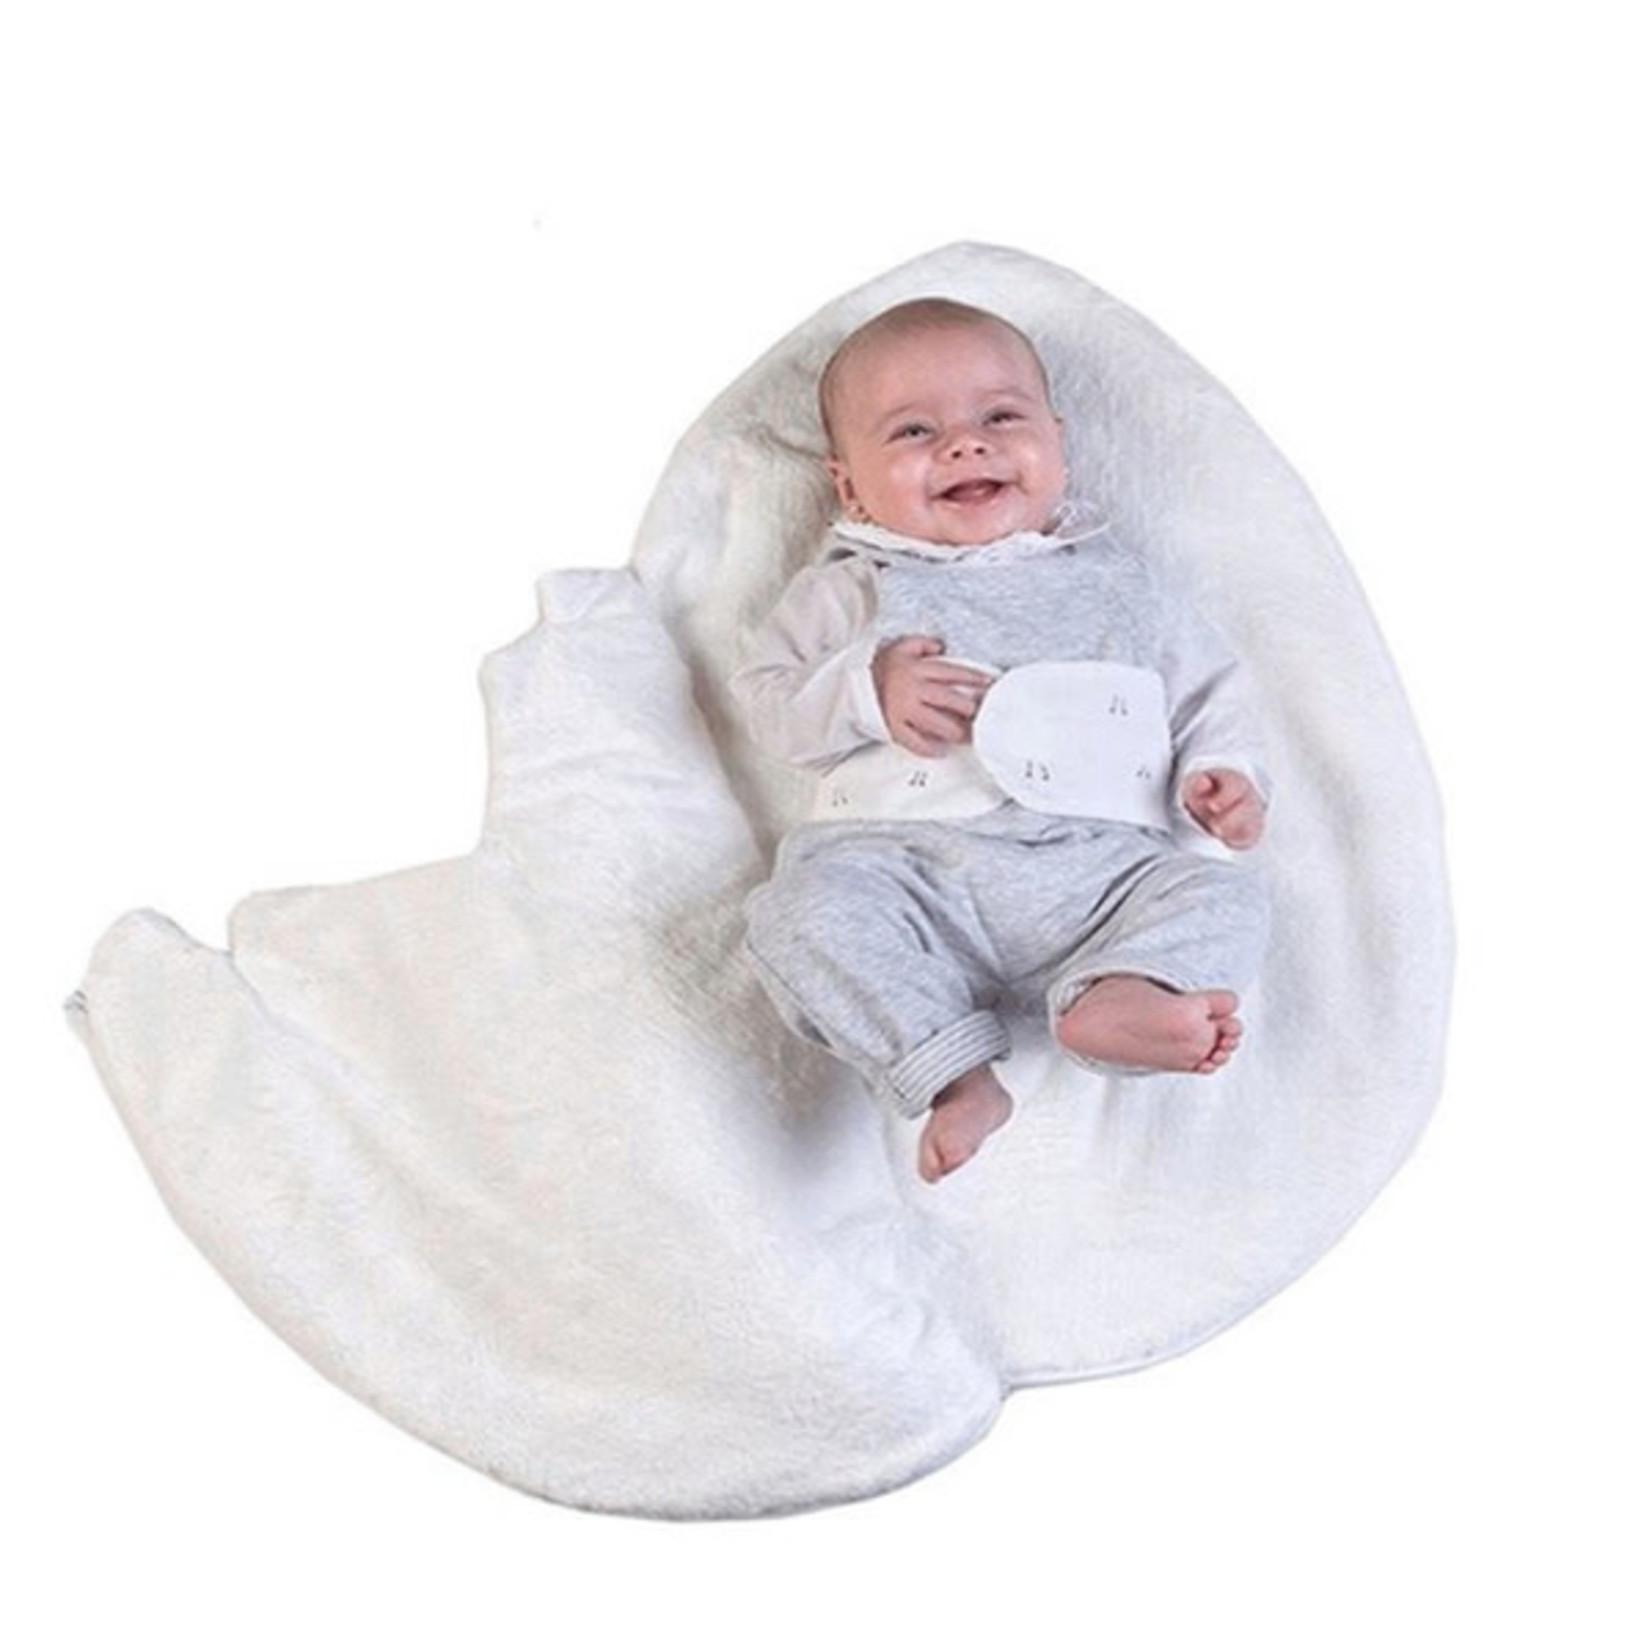 Baby Bytes Egg Newborn Sleeping Bag